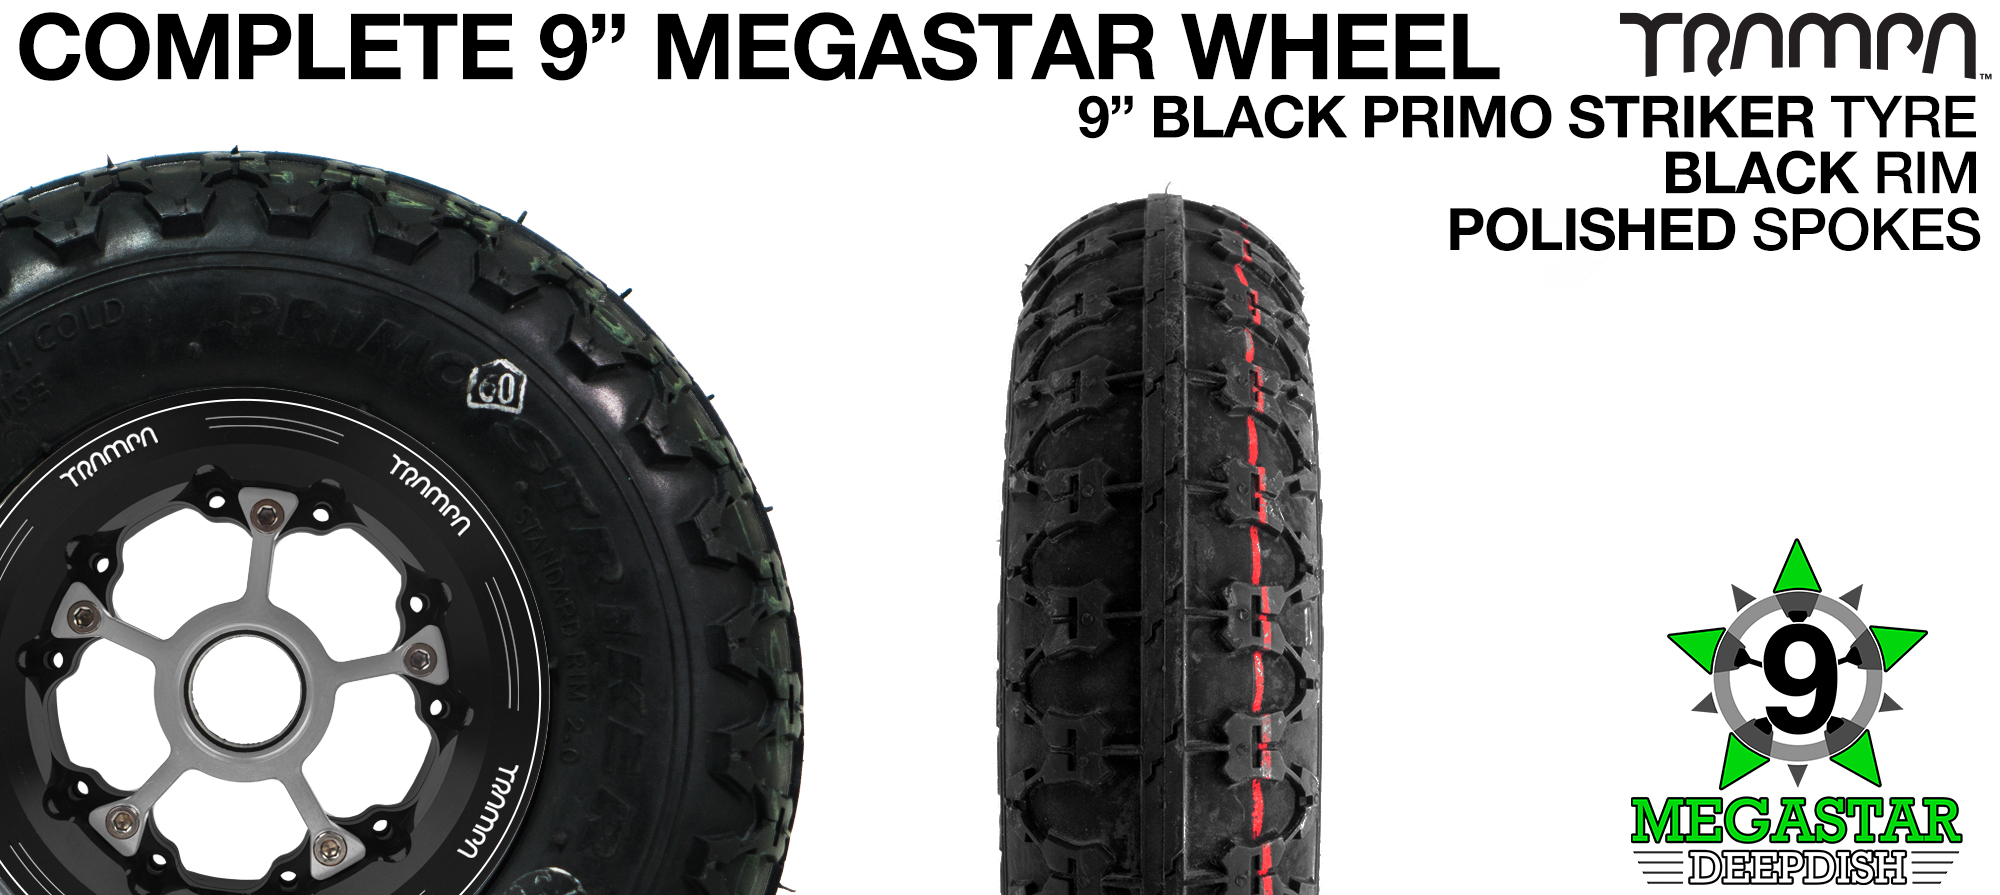 BLACK 9 inch Deep-Dish MEGASTARS Rim with POLISHED Spokes & 9 Inch PRIMO STRIKER Tyres